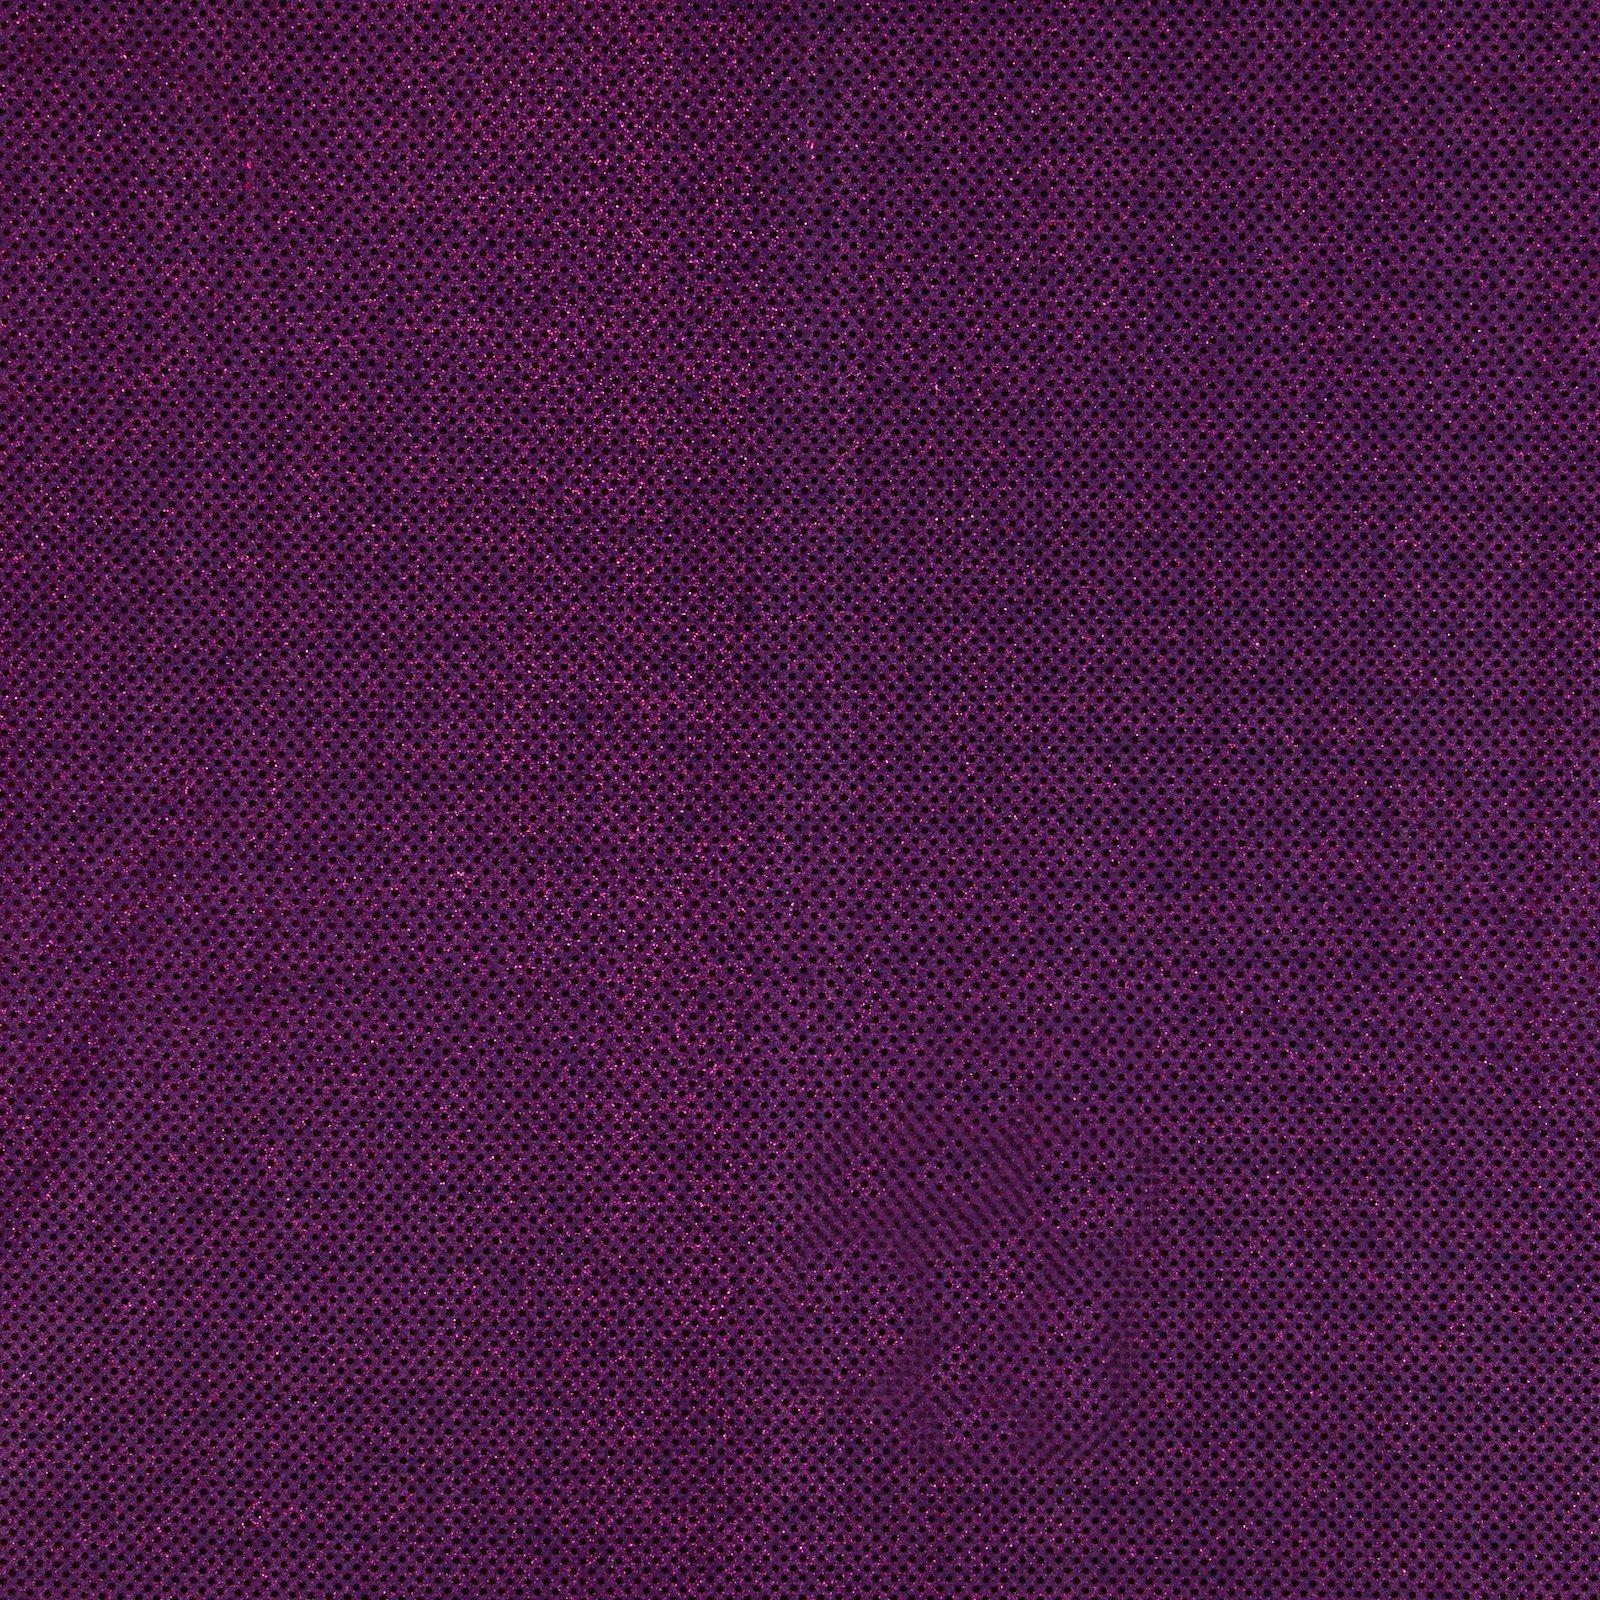 Knit with foil sequins purple 3mm 203750_pack_sp